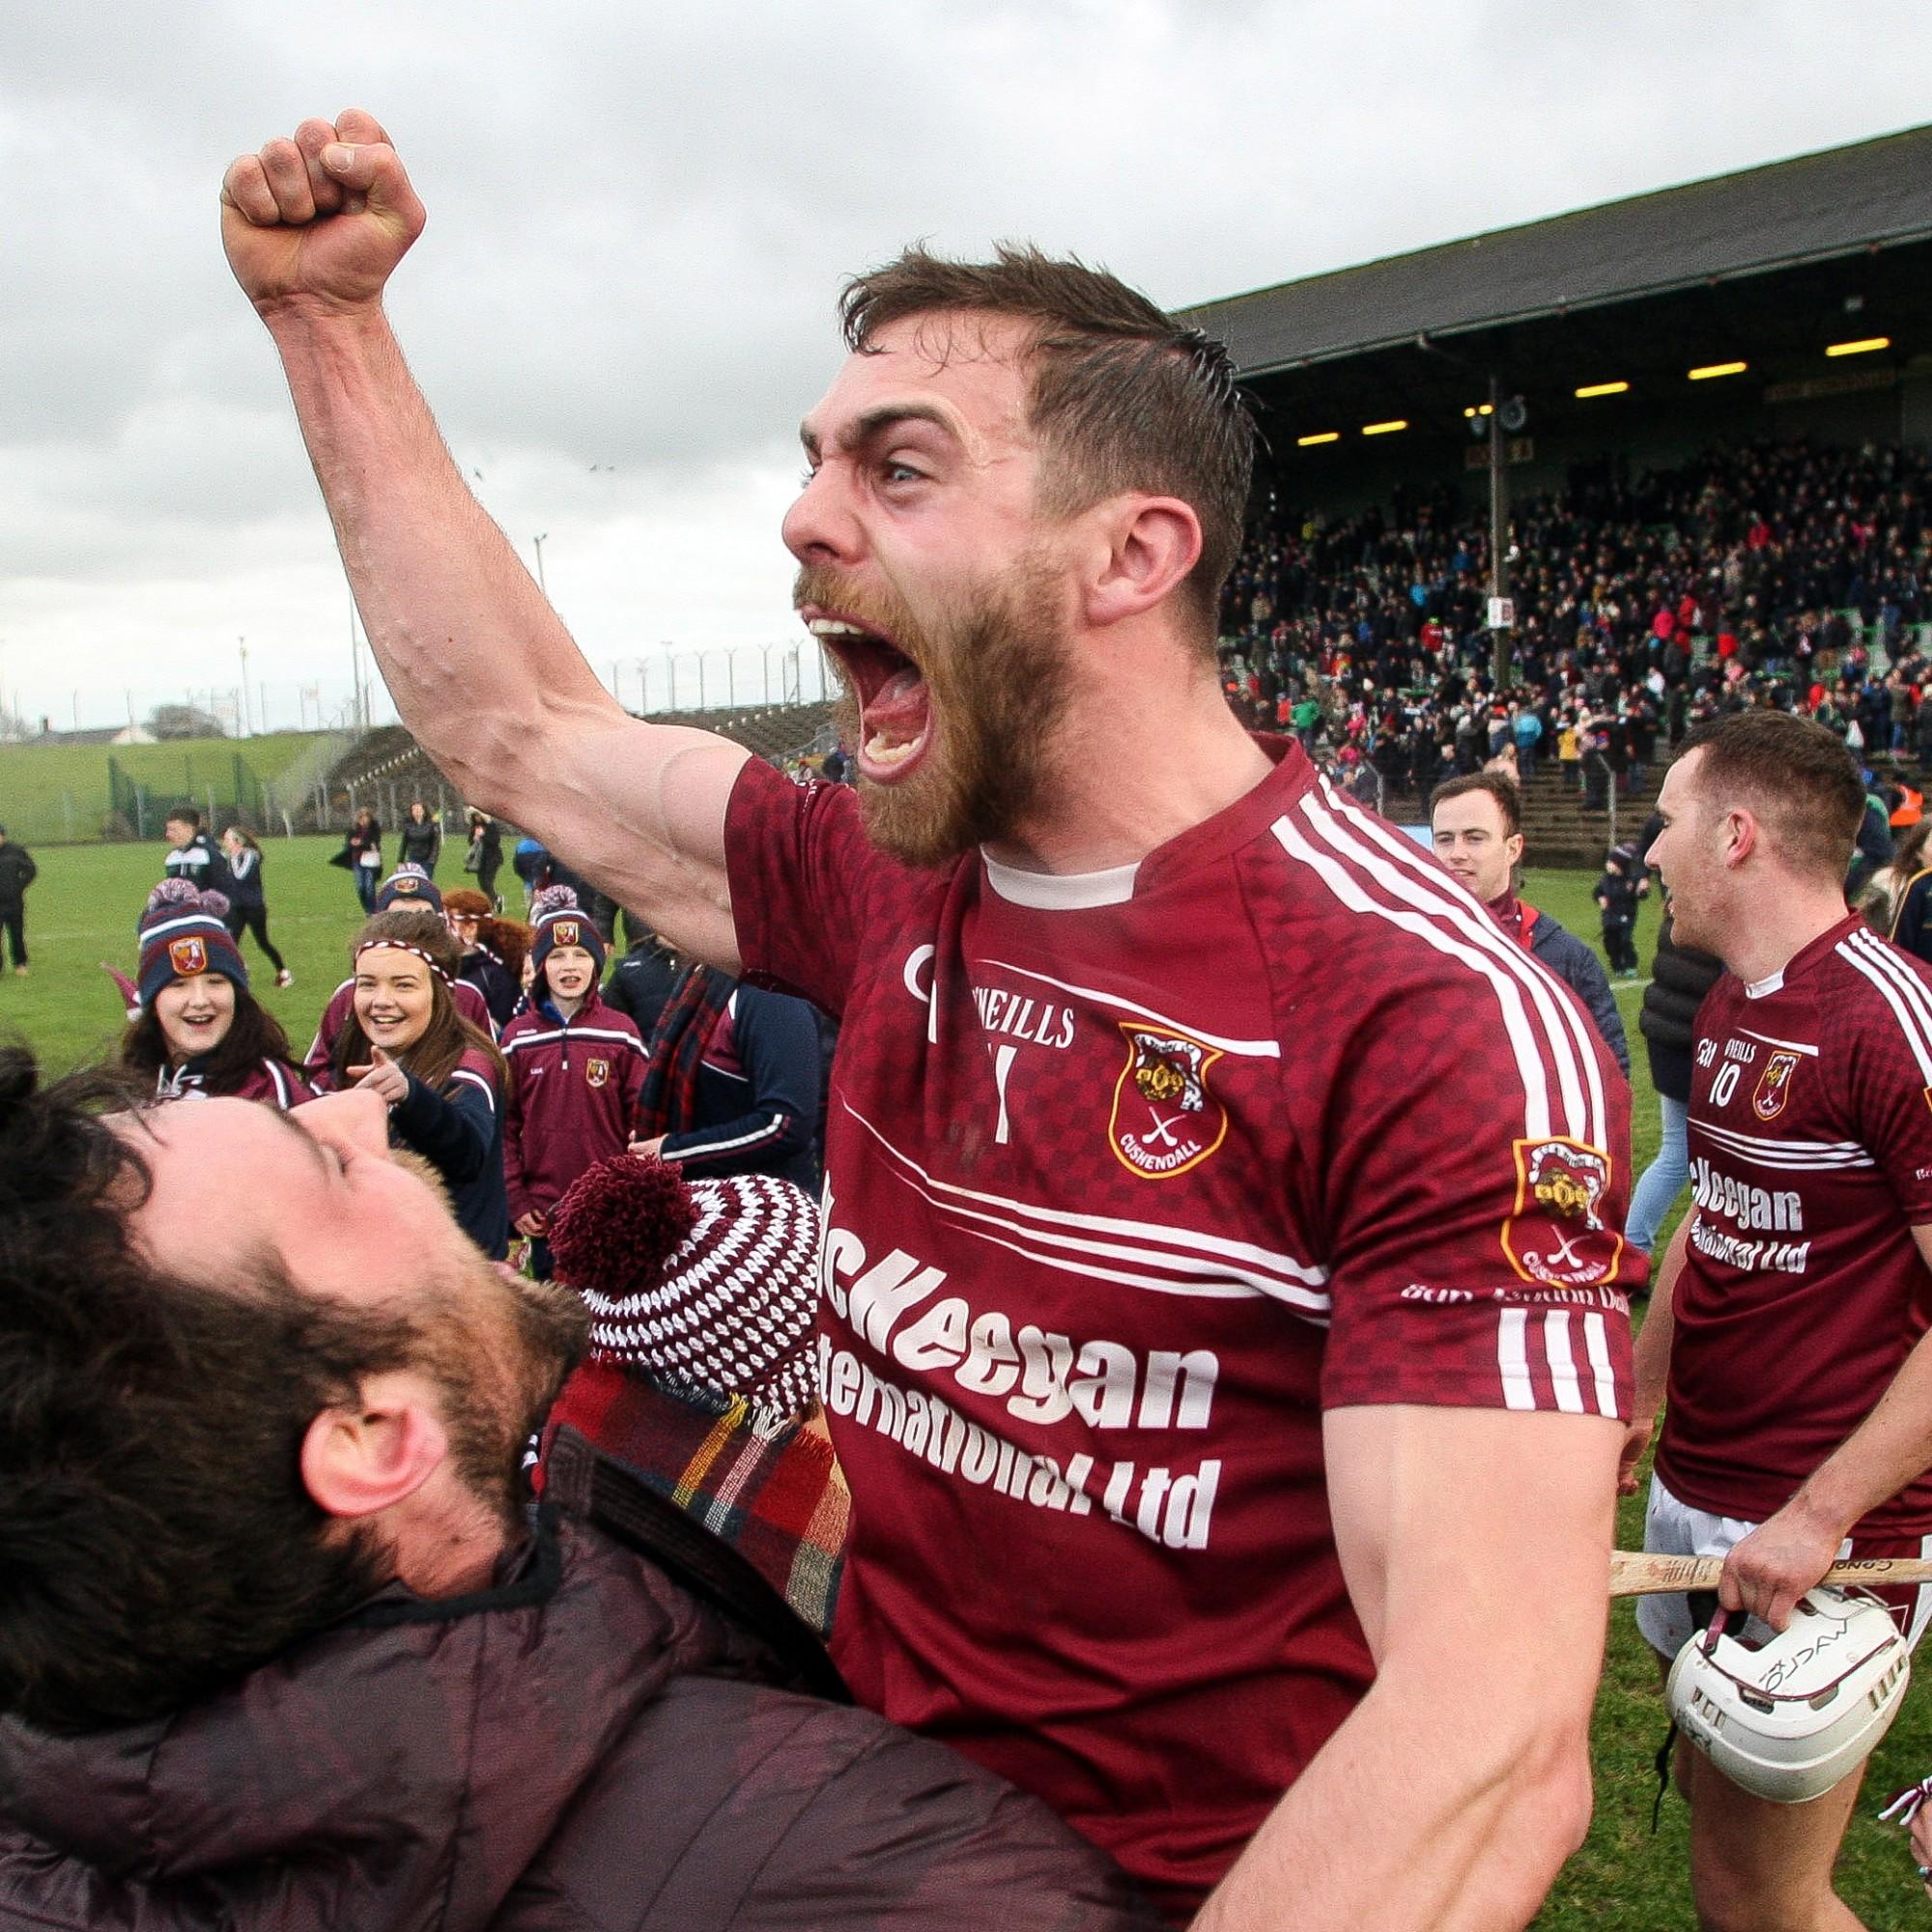 Antrim's Cushendall shock Galway's Sarsfields to reach All-Ireland club hurling final